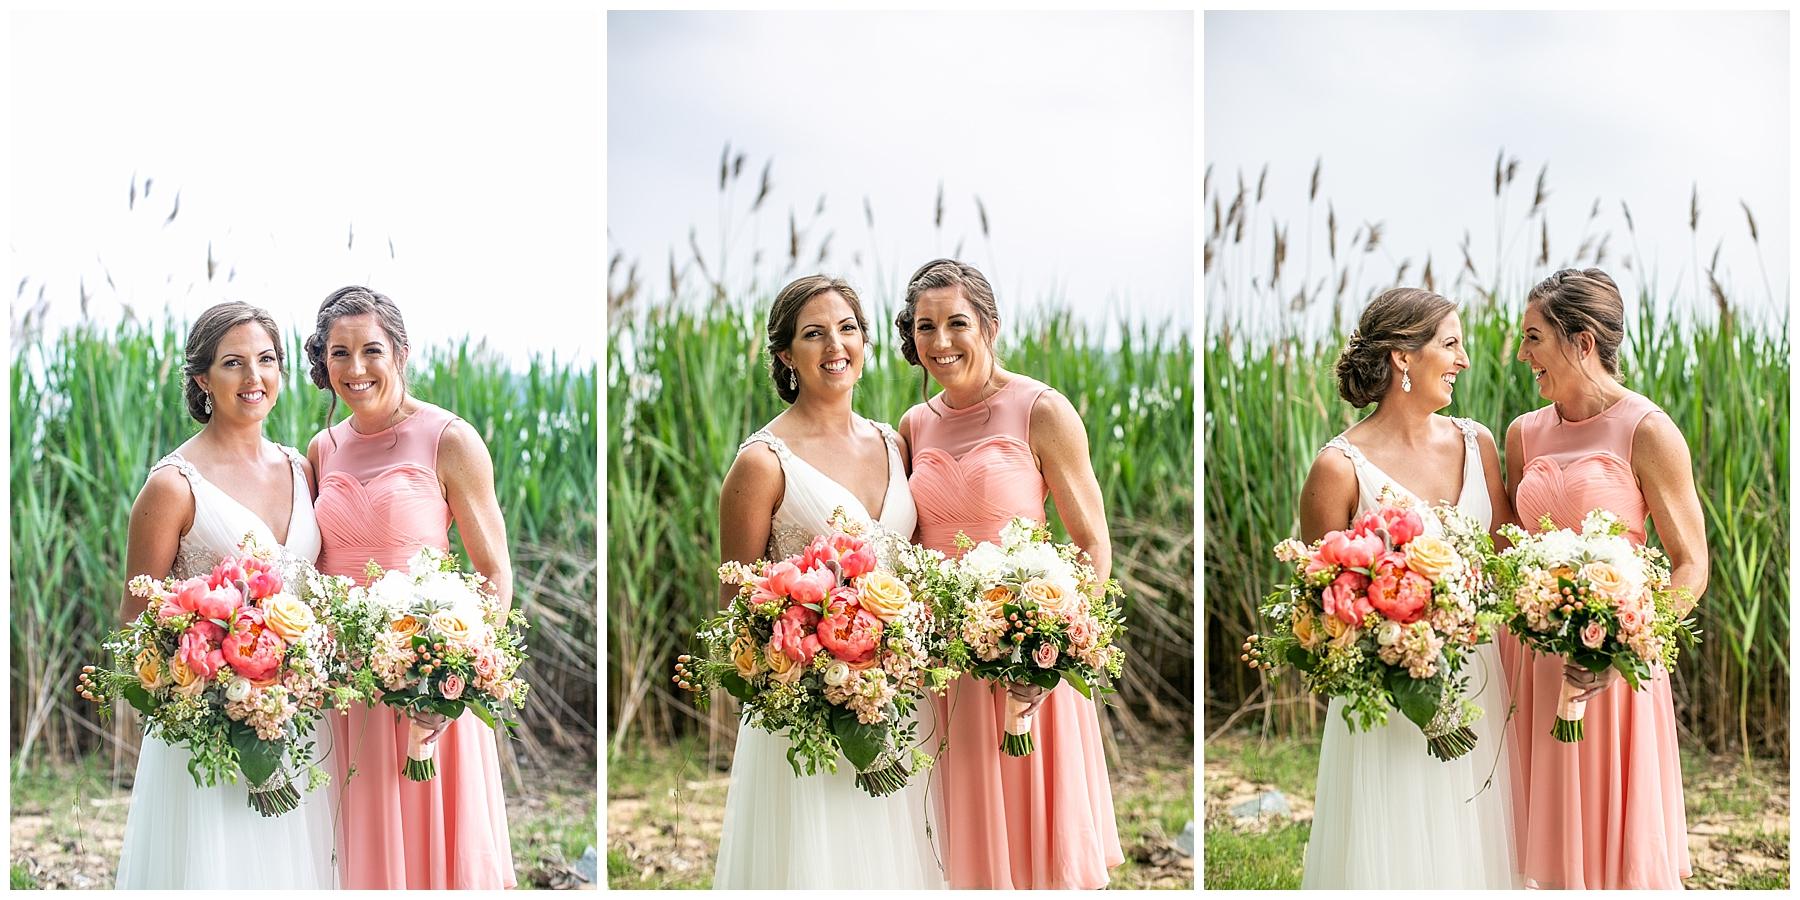 Chelsea Phil Bohemia River Overlook Wedding Living Radiant Photography photos_0063.jpg